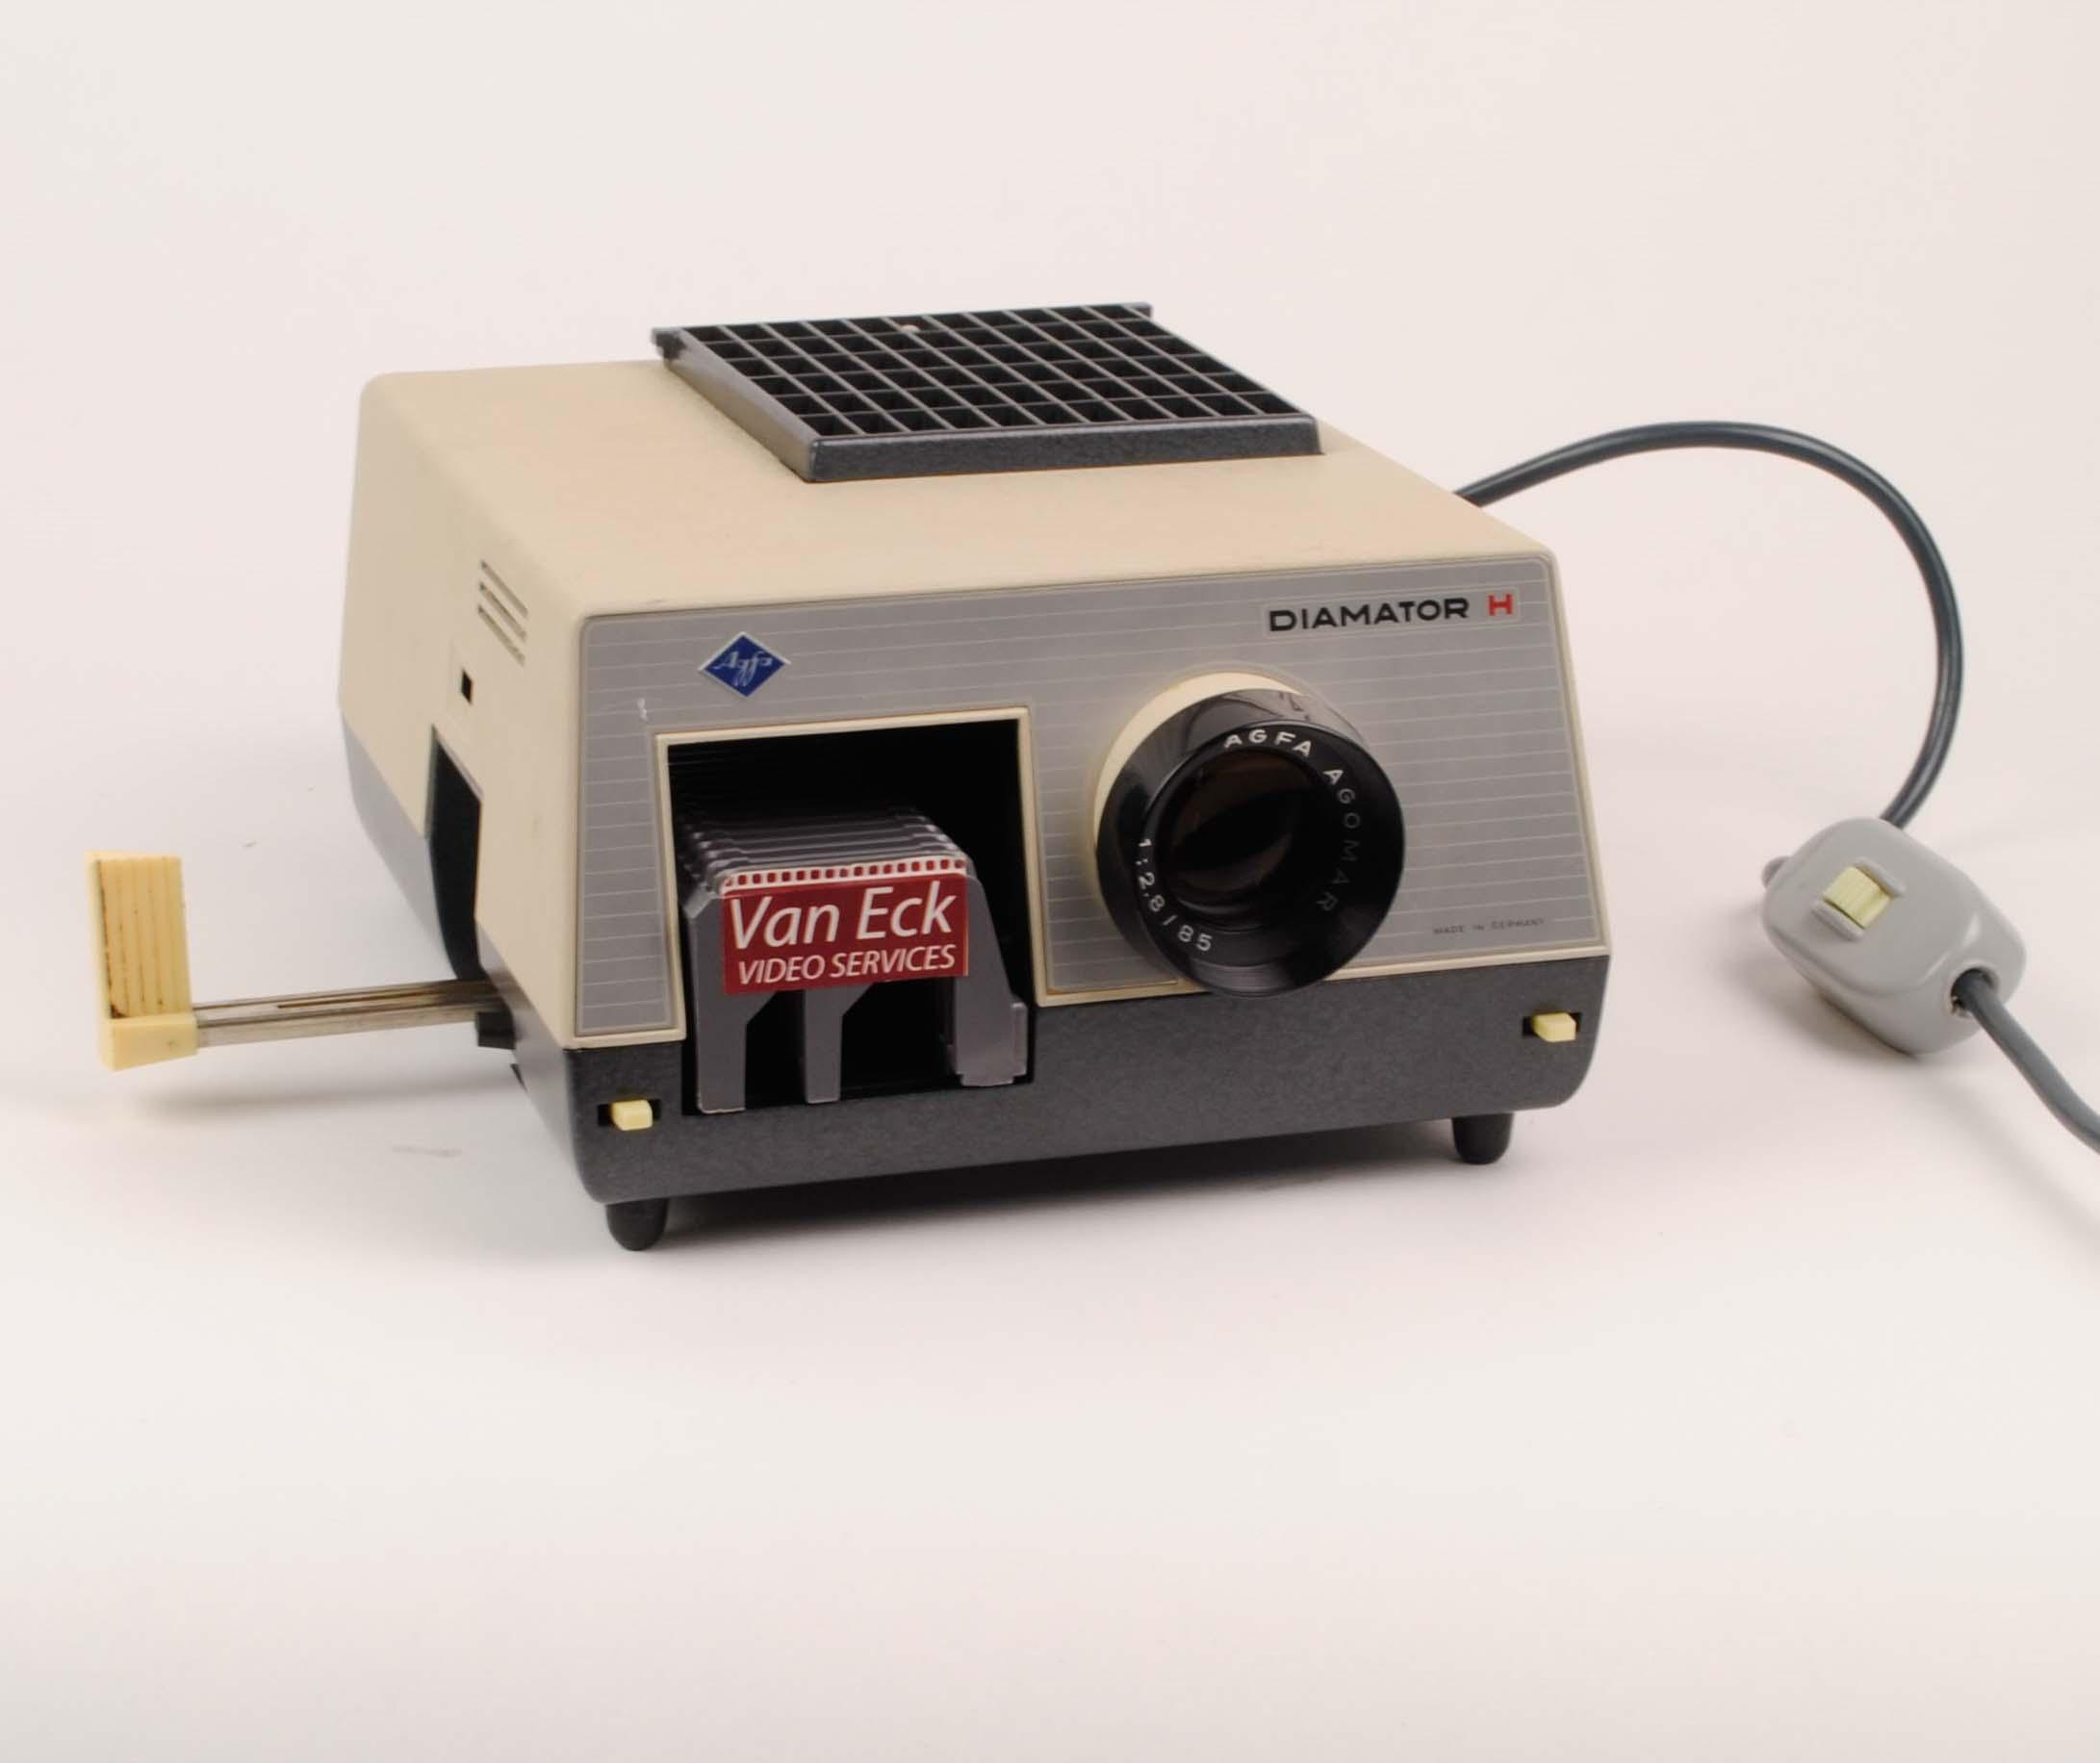 agfa diamator 1500 slide projector instructions